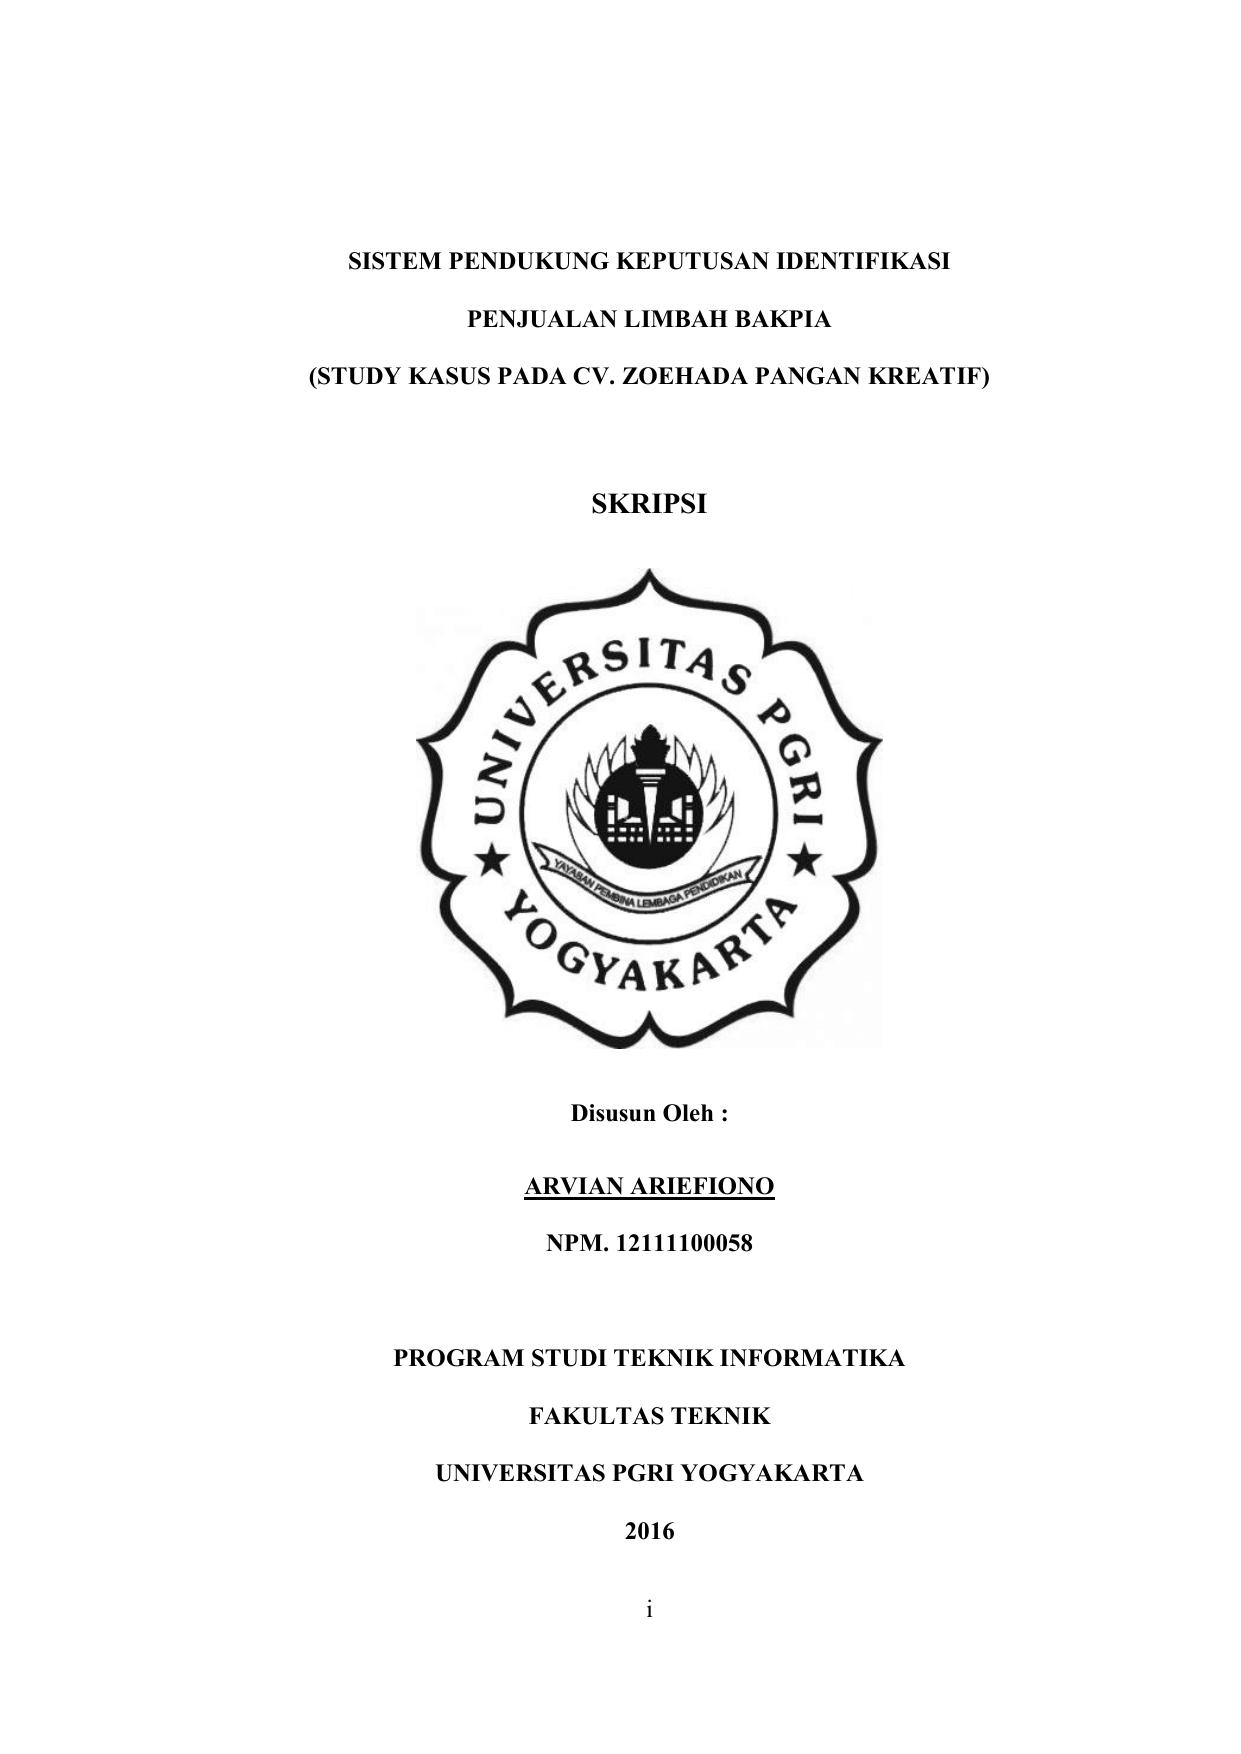 Skripsi Repository Universitas Pgri Yogyakarta